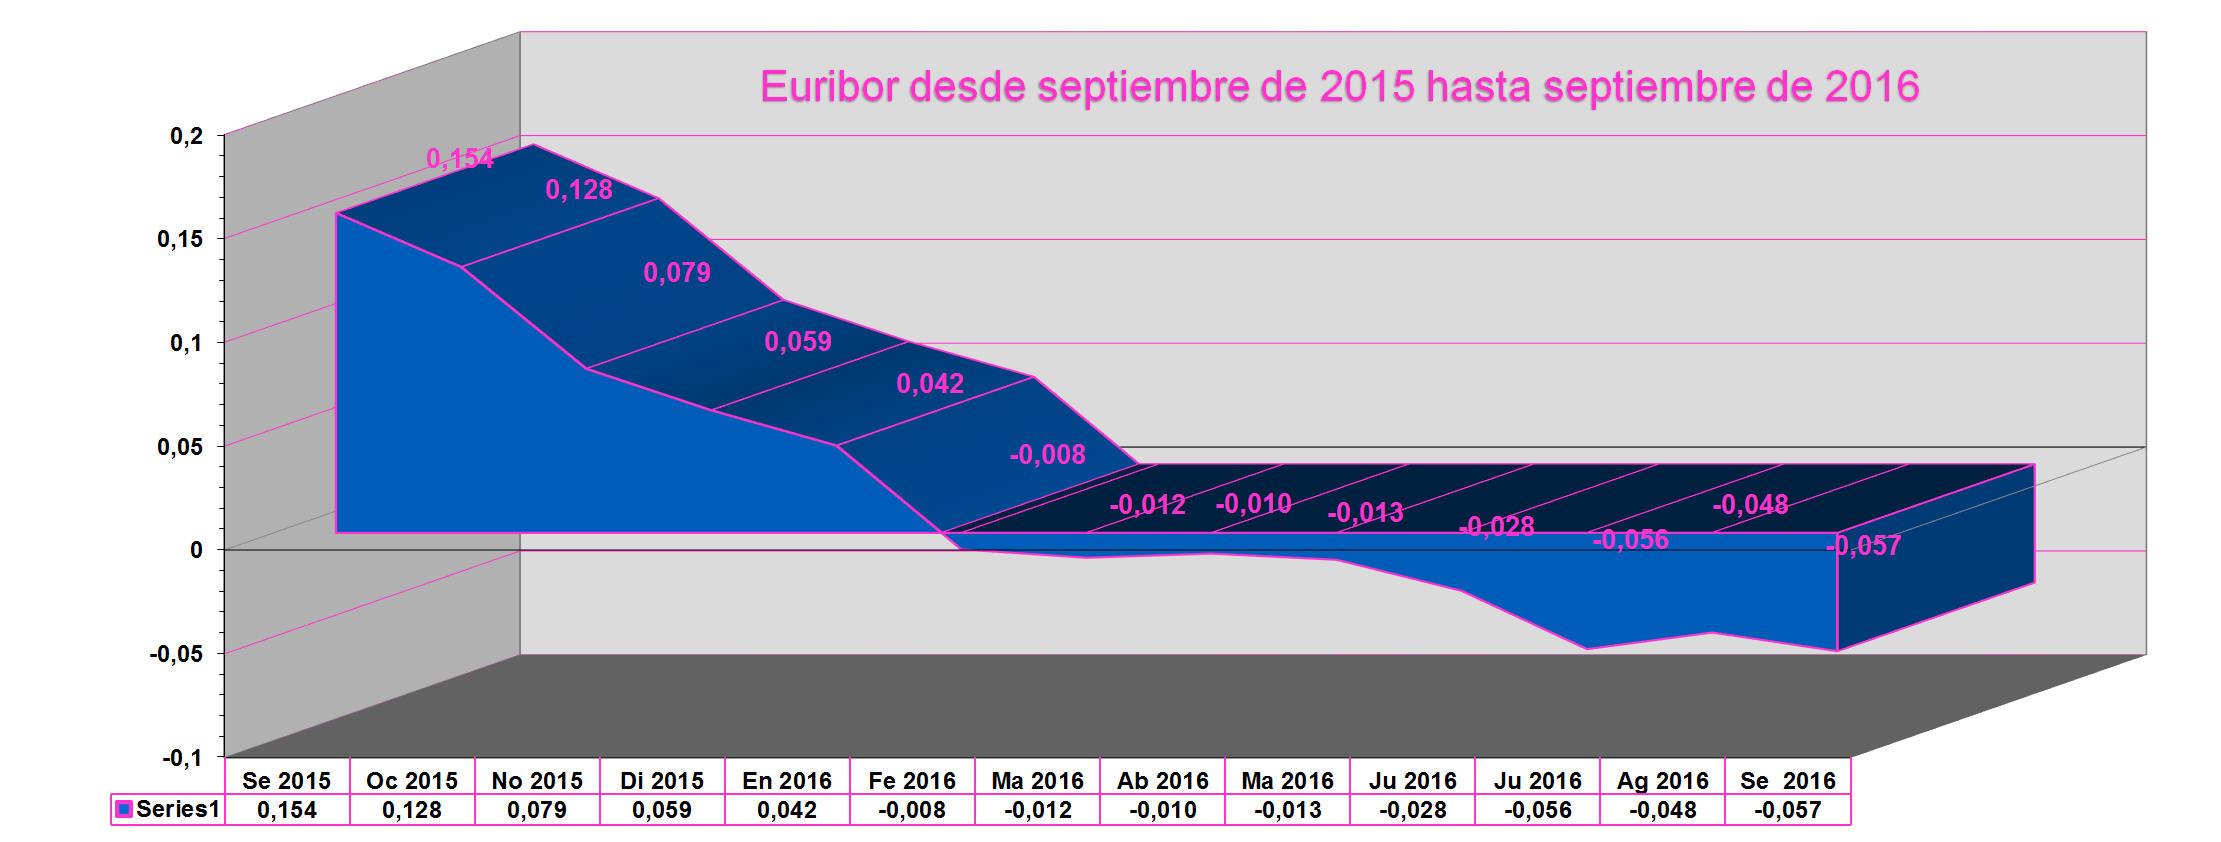 grafico_euribor septiembre 2016